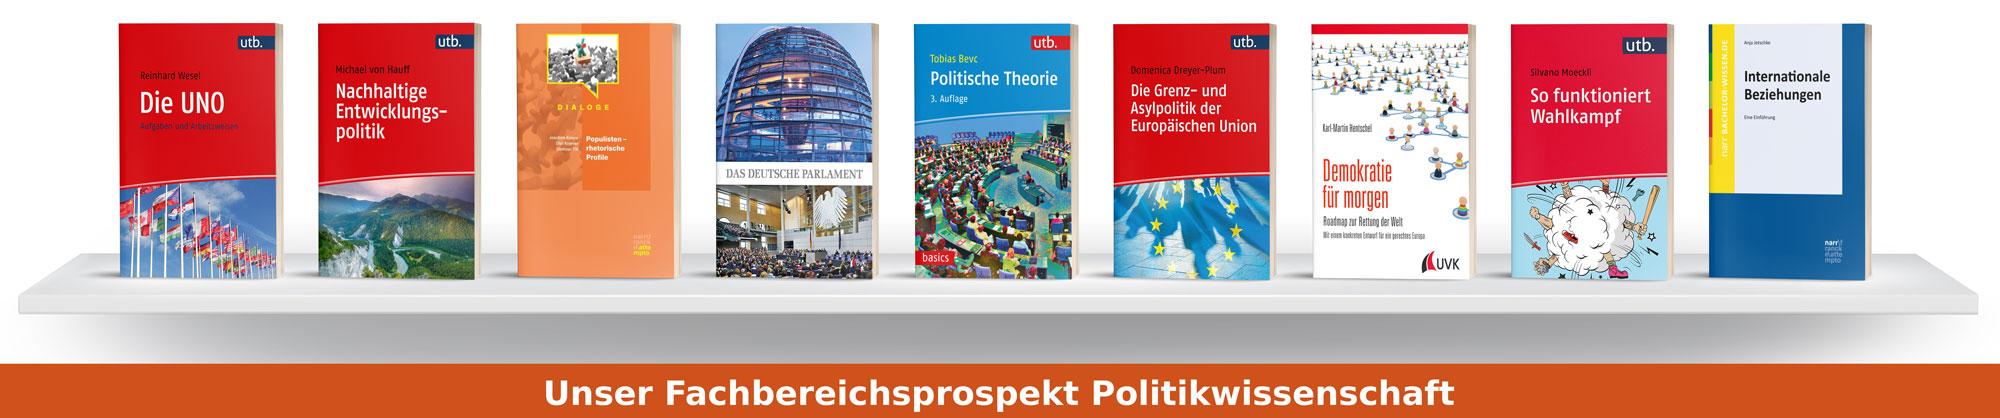 Fachbereichsprospekt Politikwissenschaft